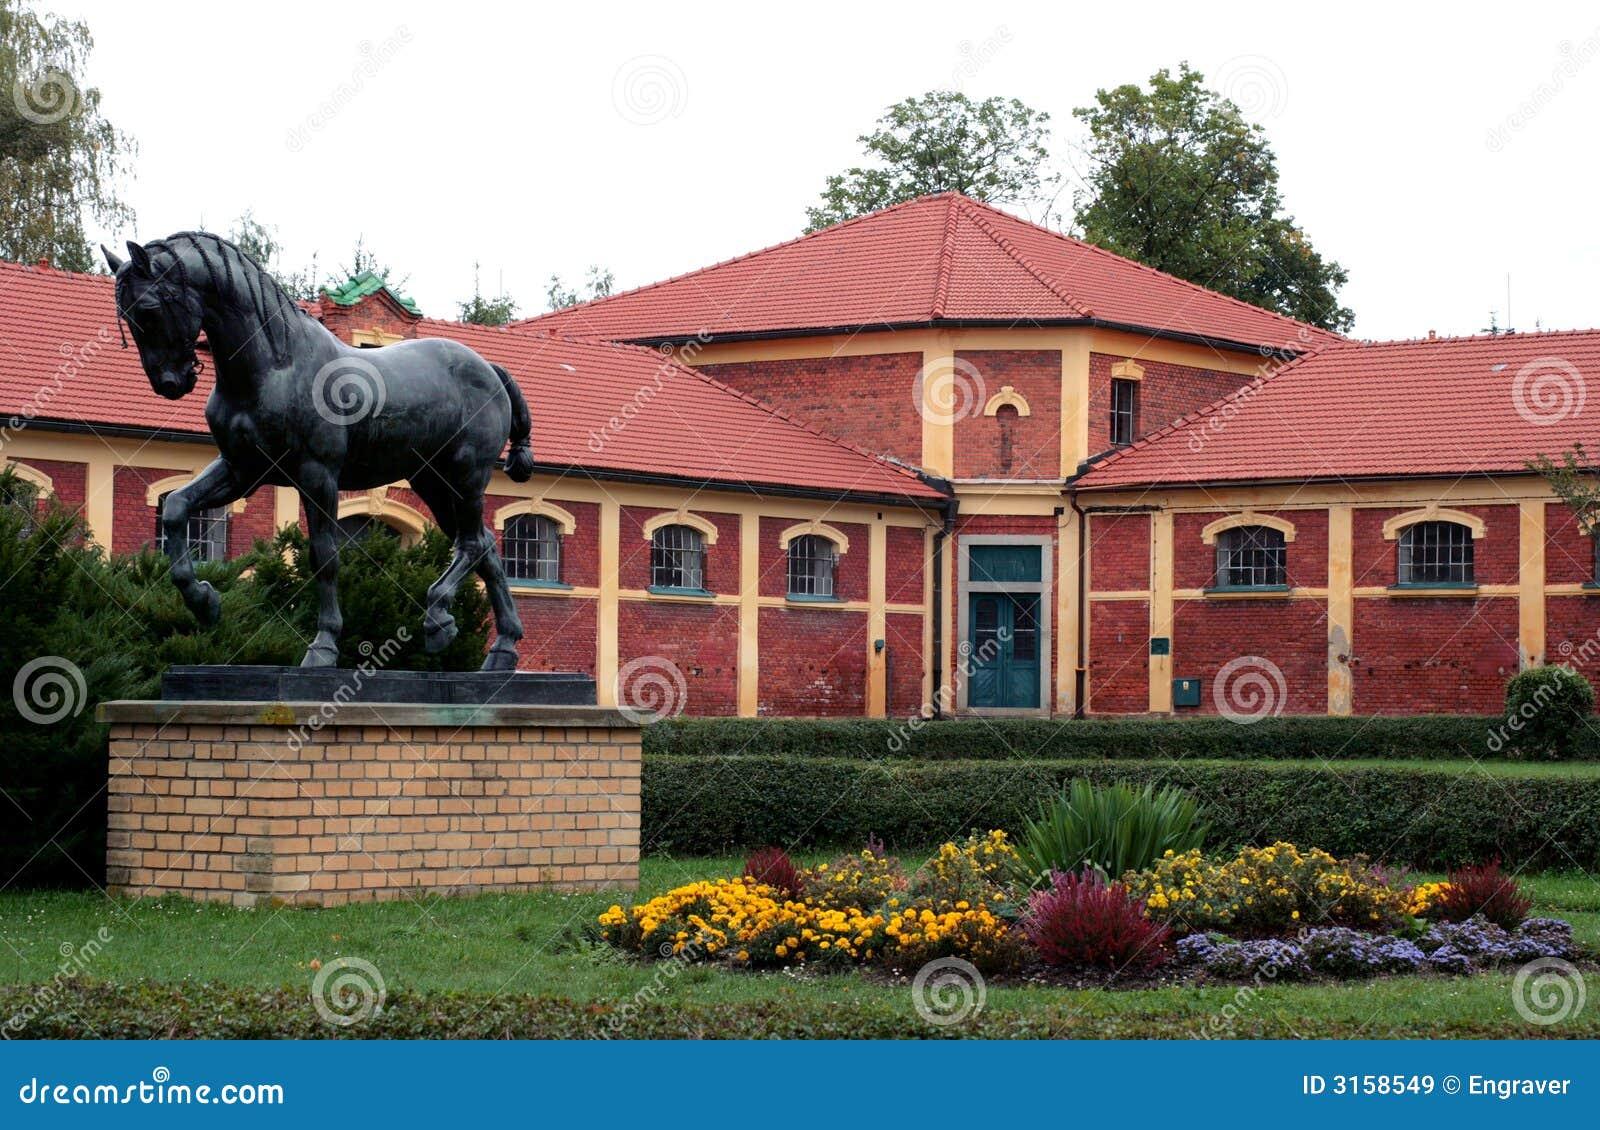 Horse Sculpture Stud Farm Stock Image Image Of Architecture 3158549